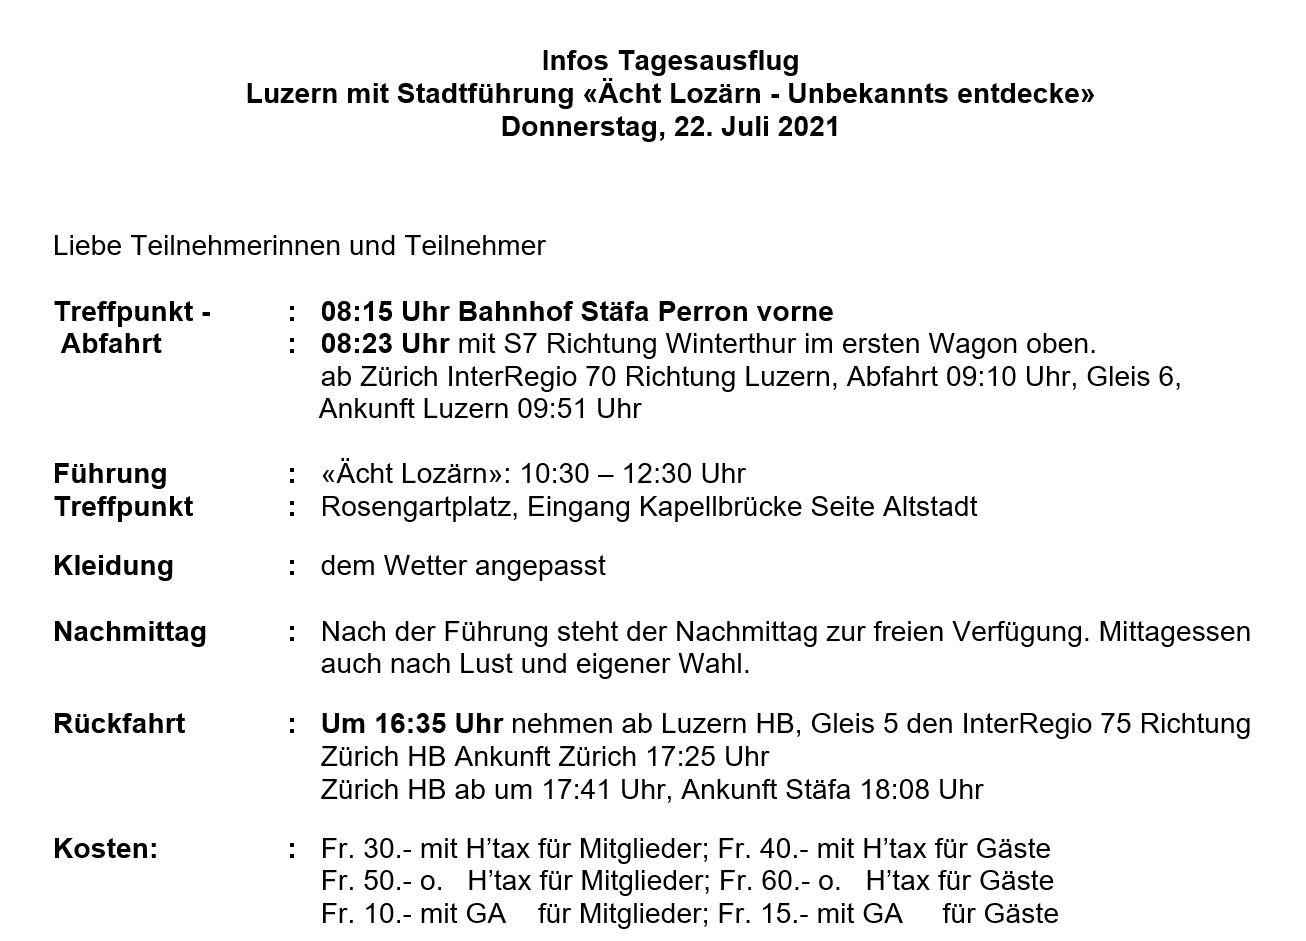 Infos Luzern